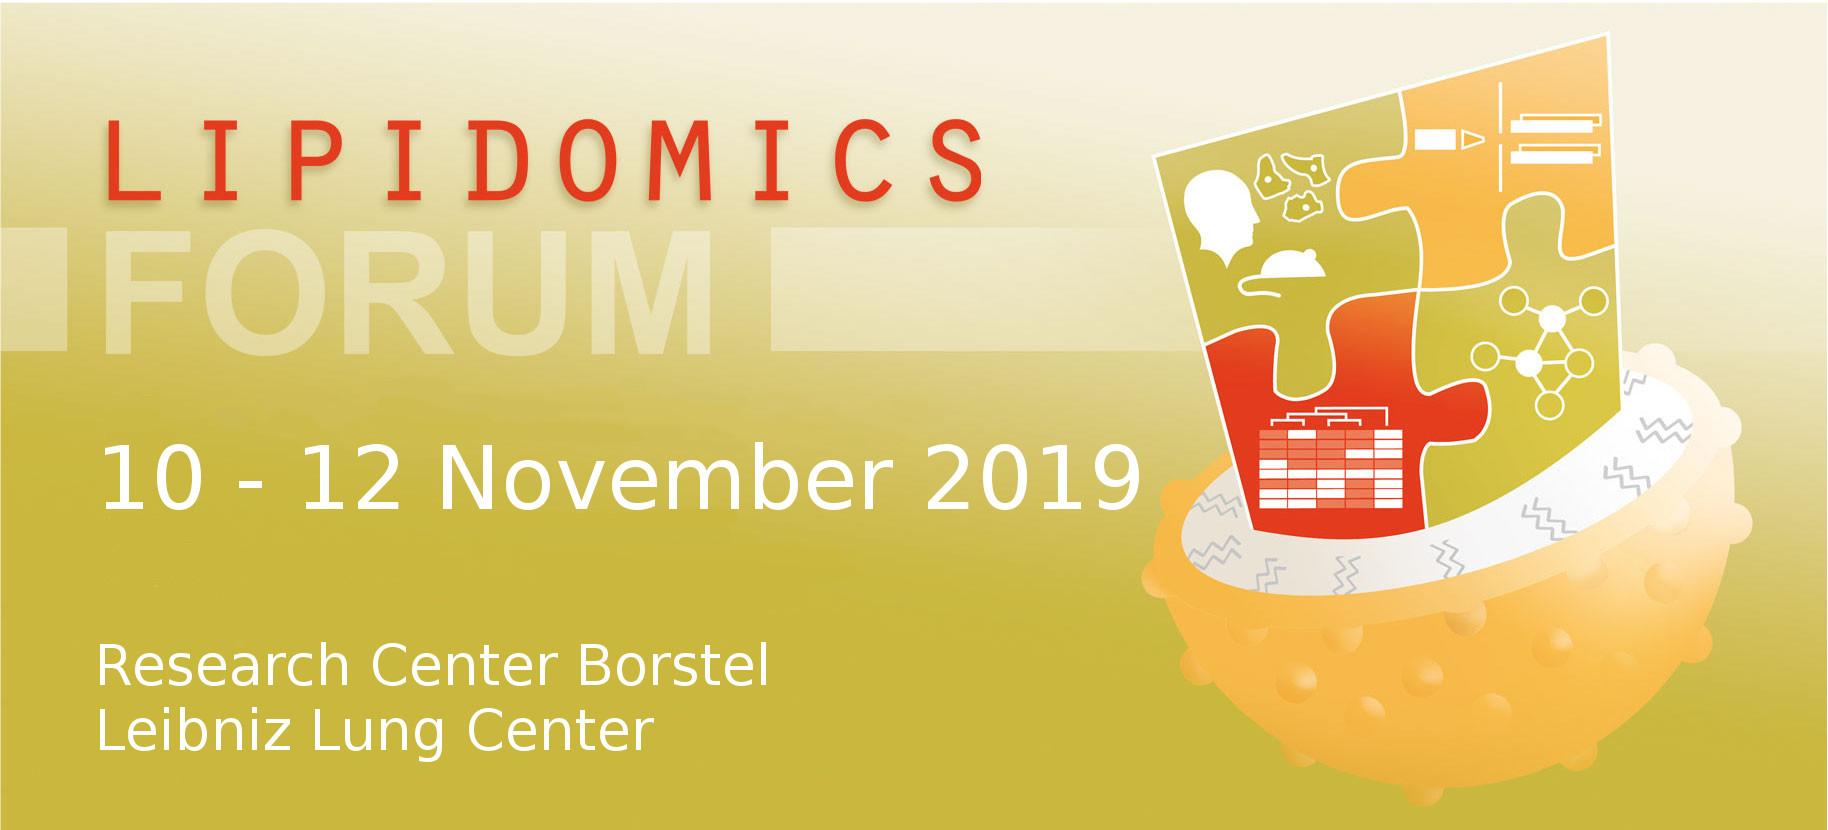 LipidomicsForum Banner 2019